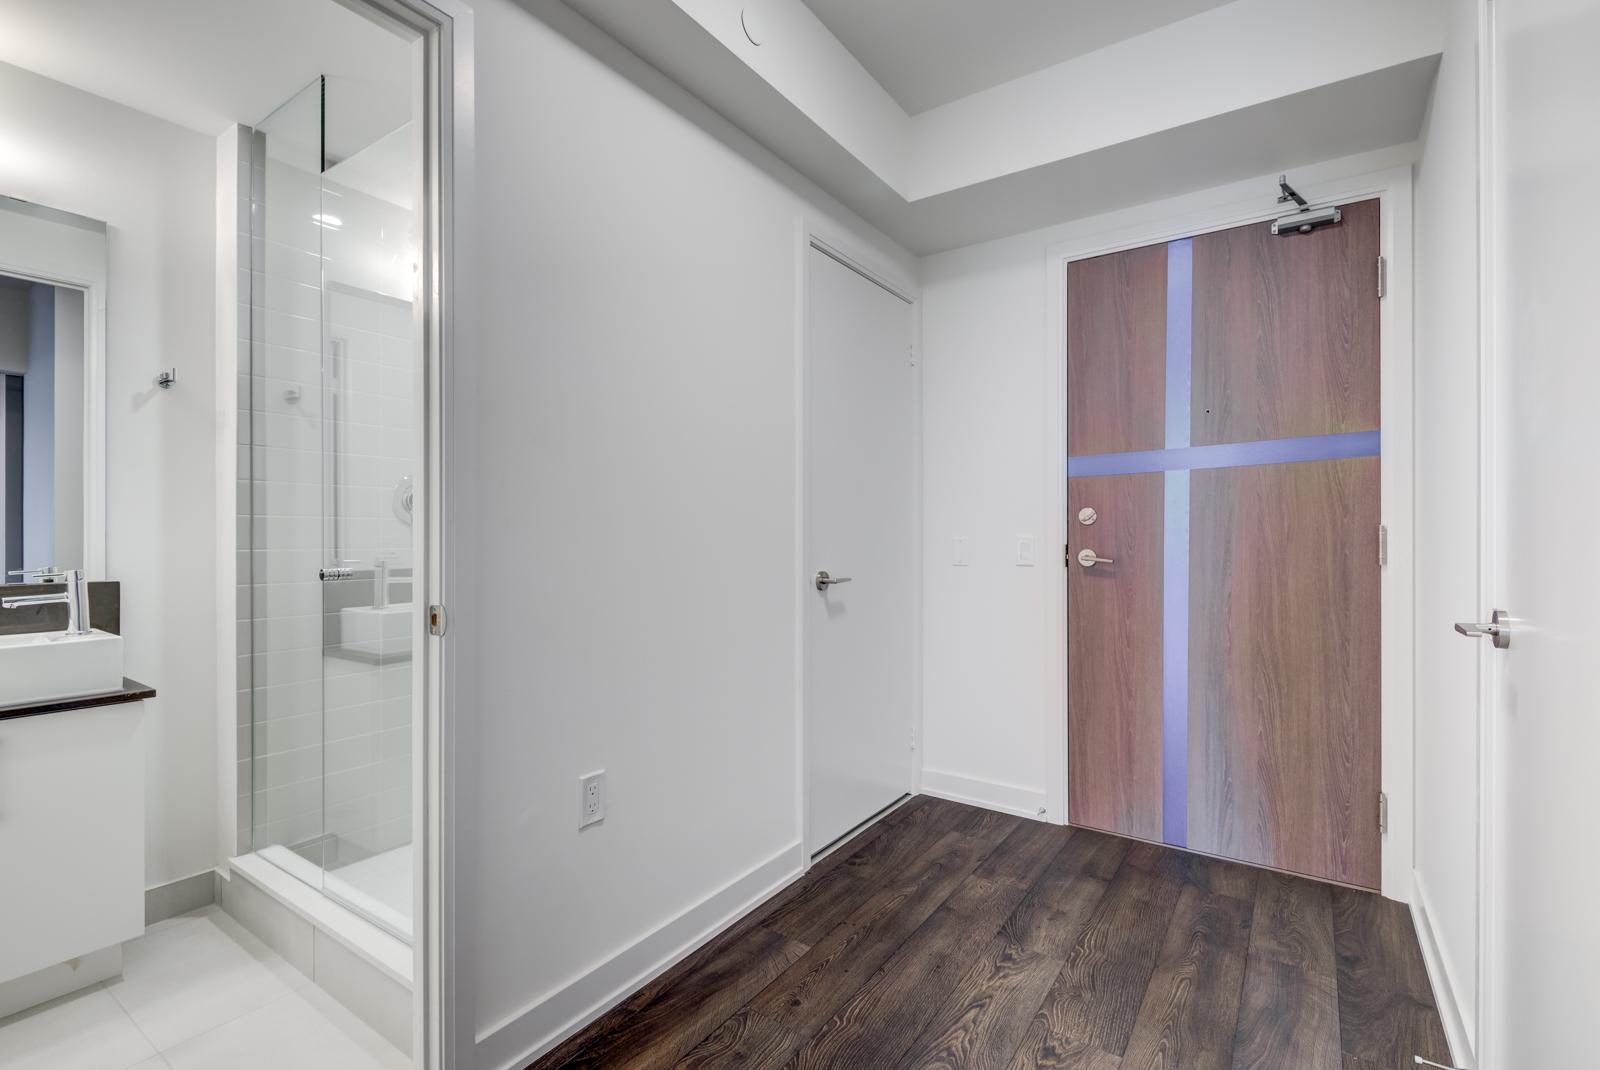 Second bathroom with open door; hallway and front entrance.